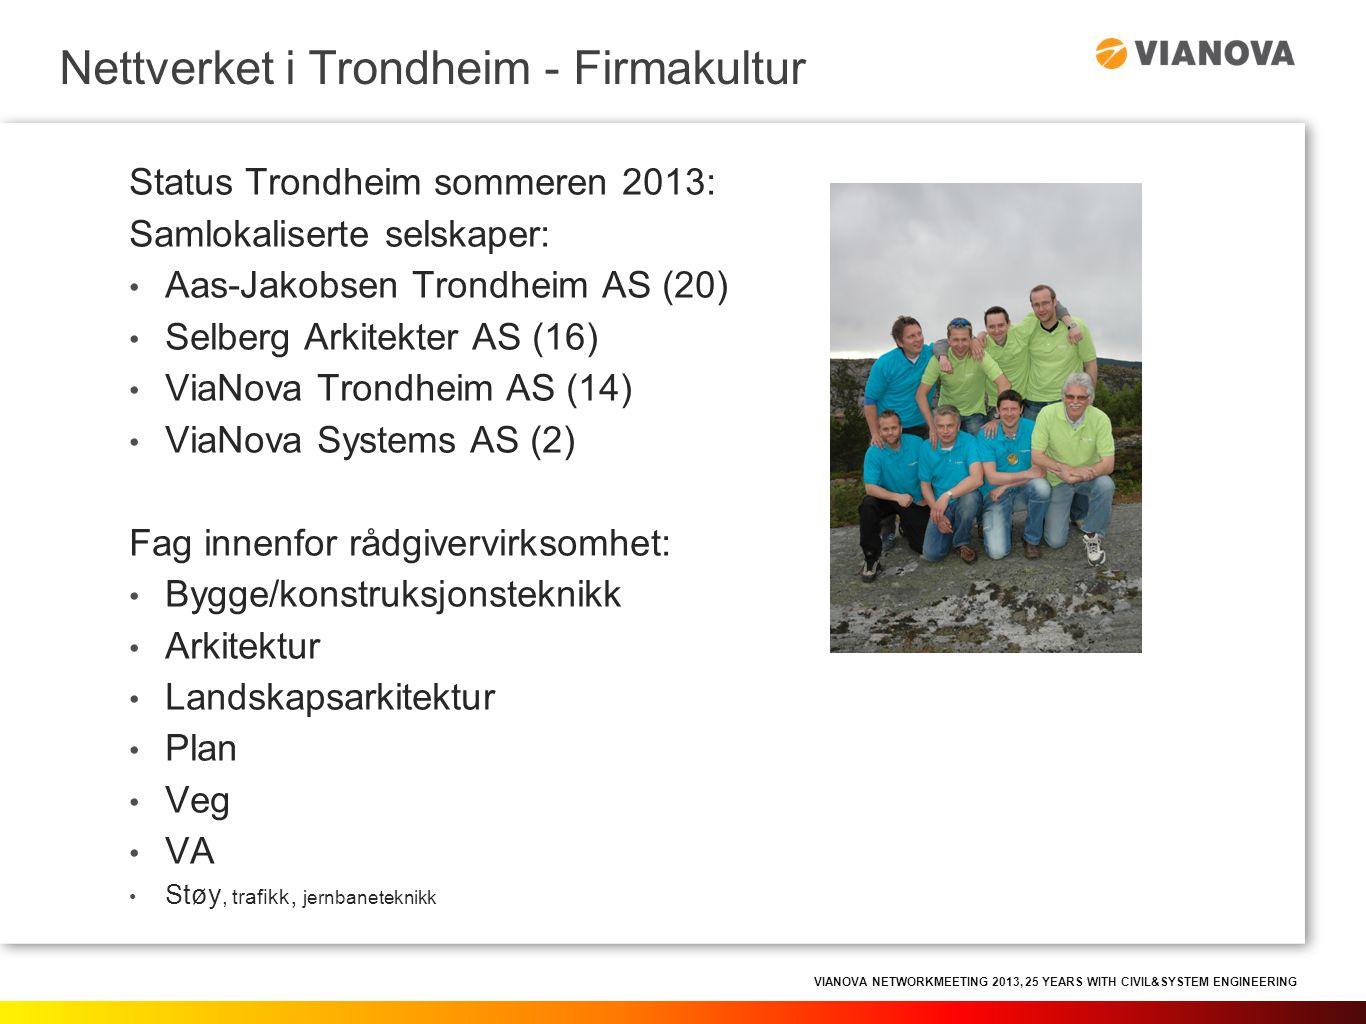 VIANOVA NETWORKMEETING 2013, 25 YEARS WITH CIVIL&SYSTEM ENGINEERING Knoppskytingen i Trondheim kunne ikke skjedd uten firmakultur.